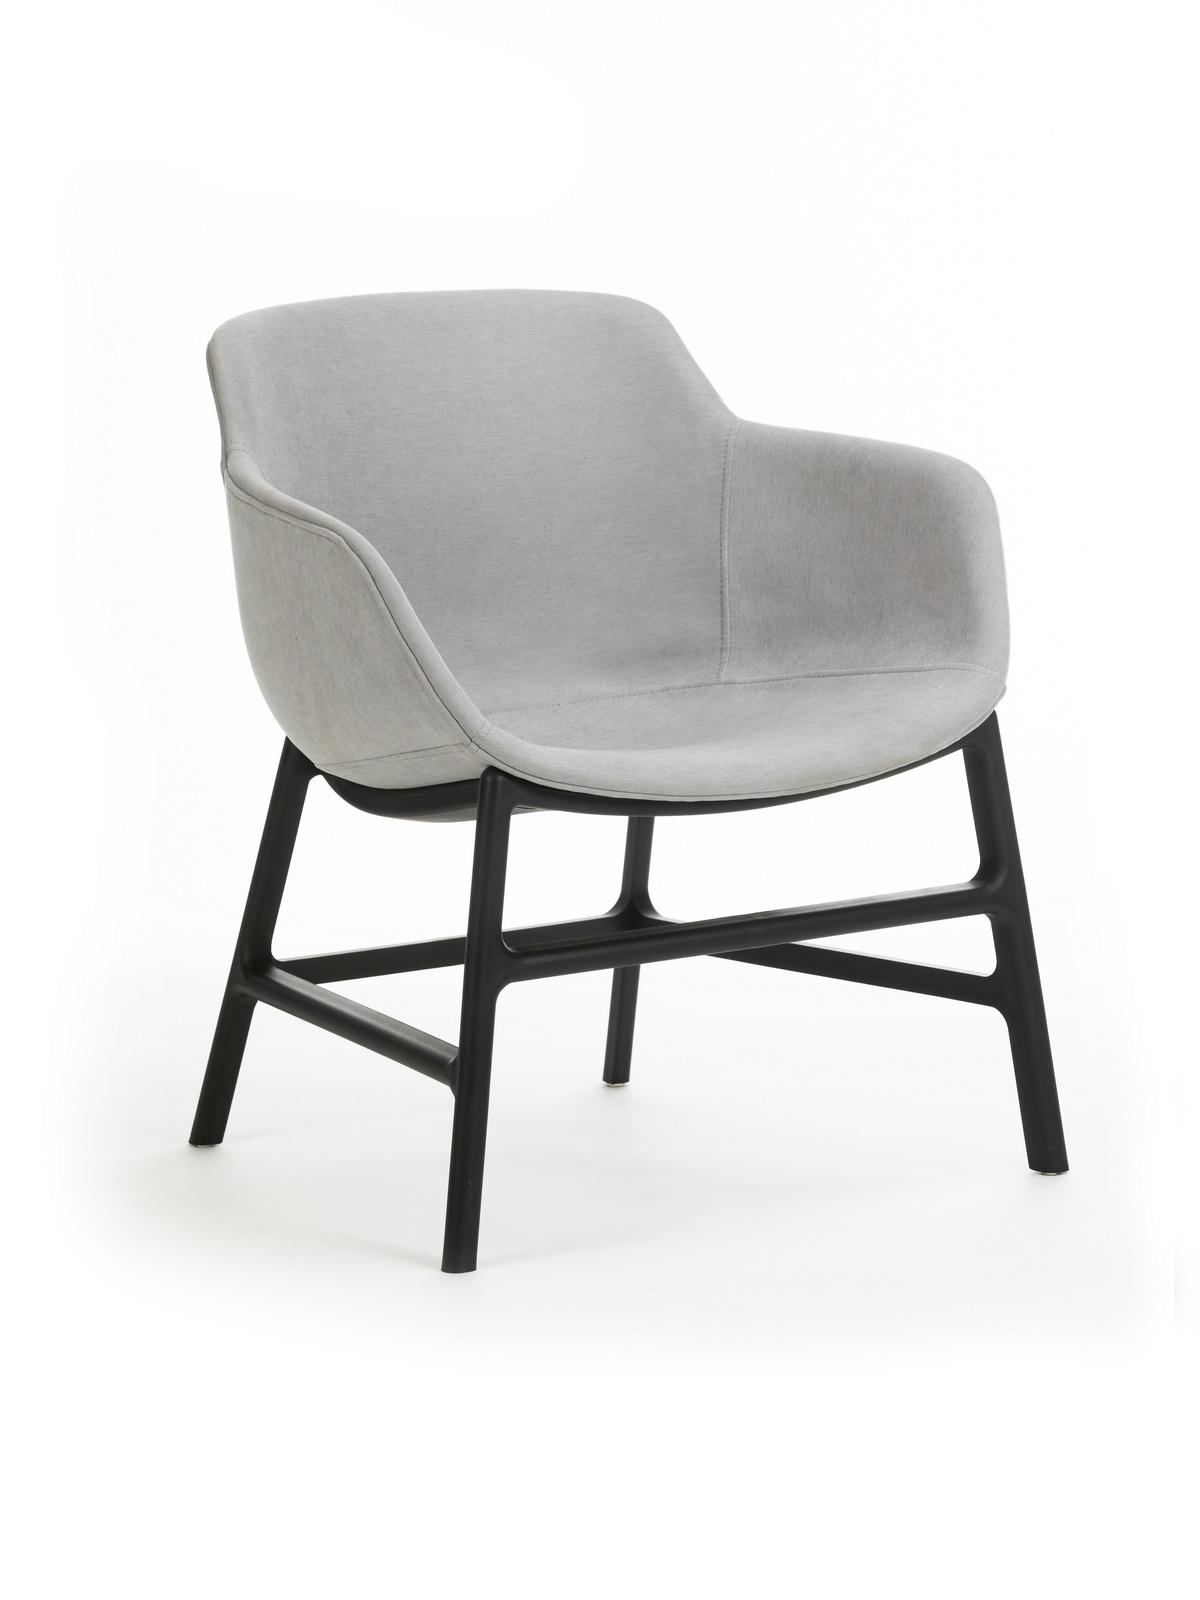 Scaun din plastic tapitat cu stofa, cu picioare din metal Shirley Grey, l63xA62xH70 cm